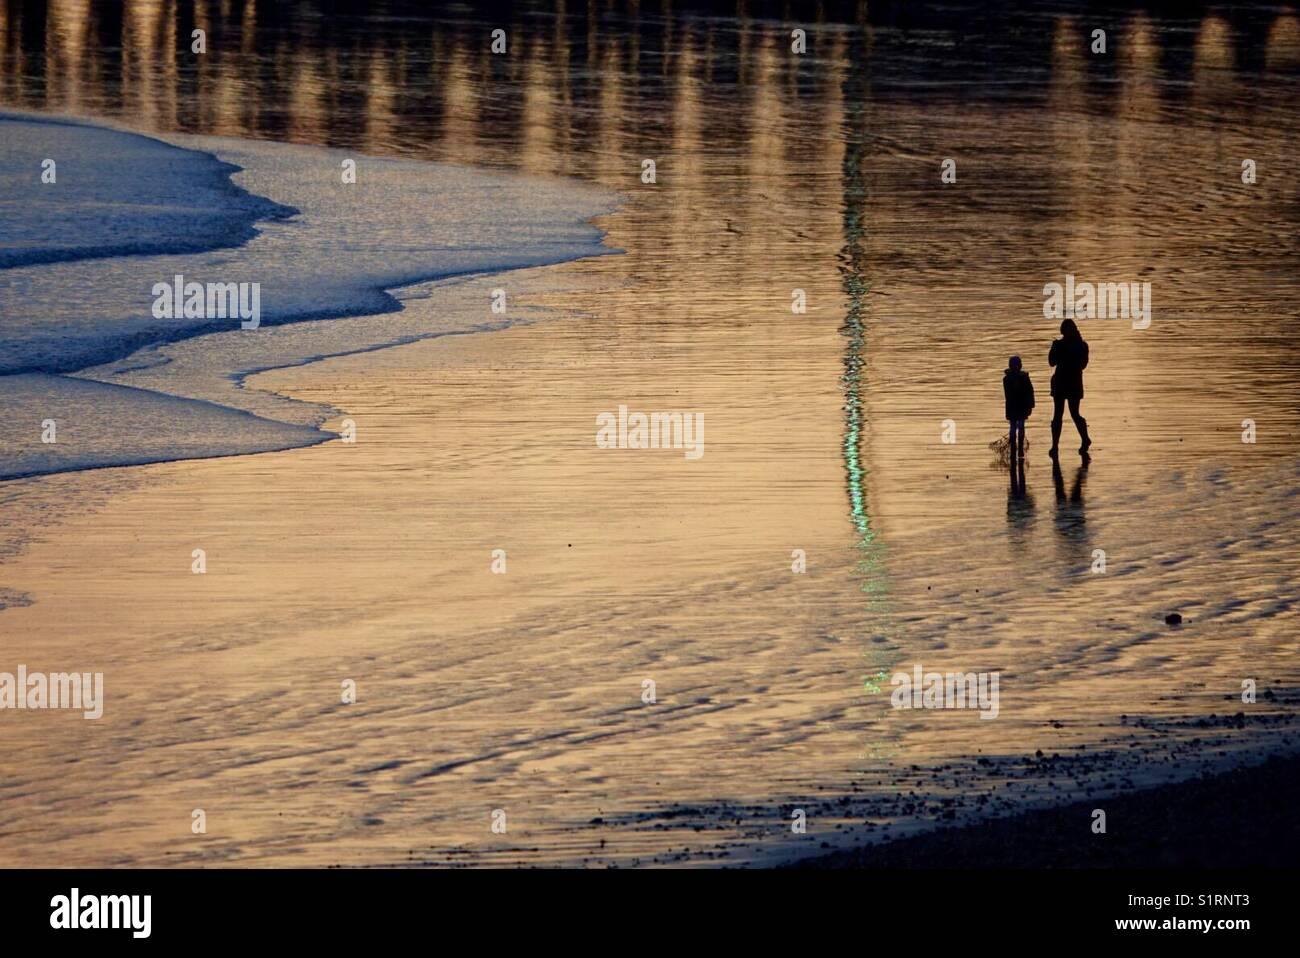 La luz del atardecer en newhaven East Beach Imagen De Stock